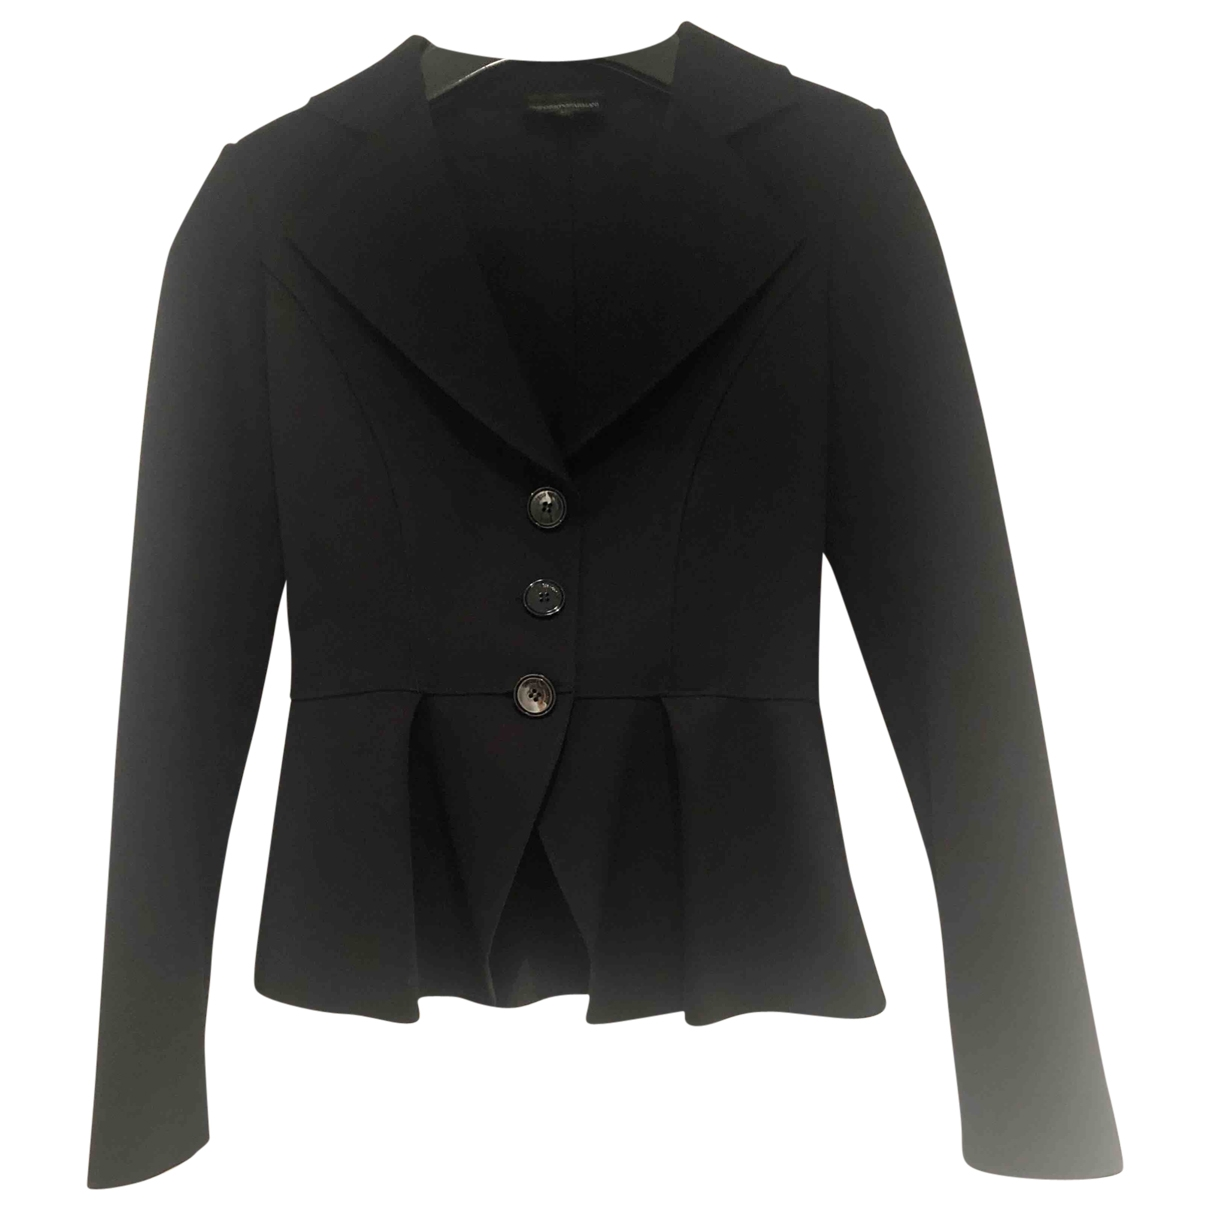 Emporio Armani \N Black jacket for Women 38 IT